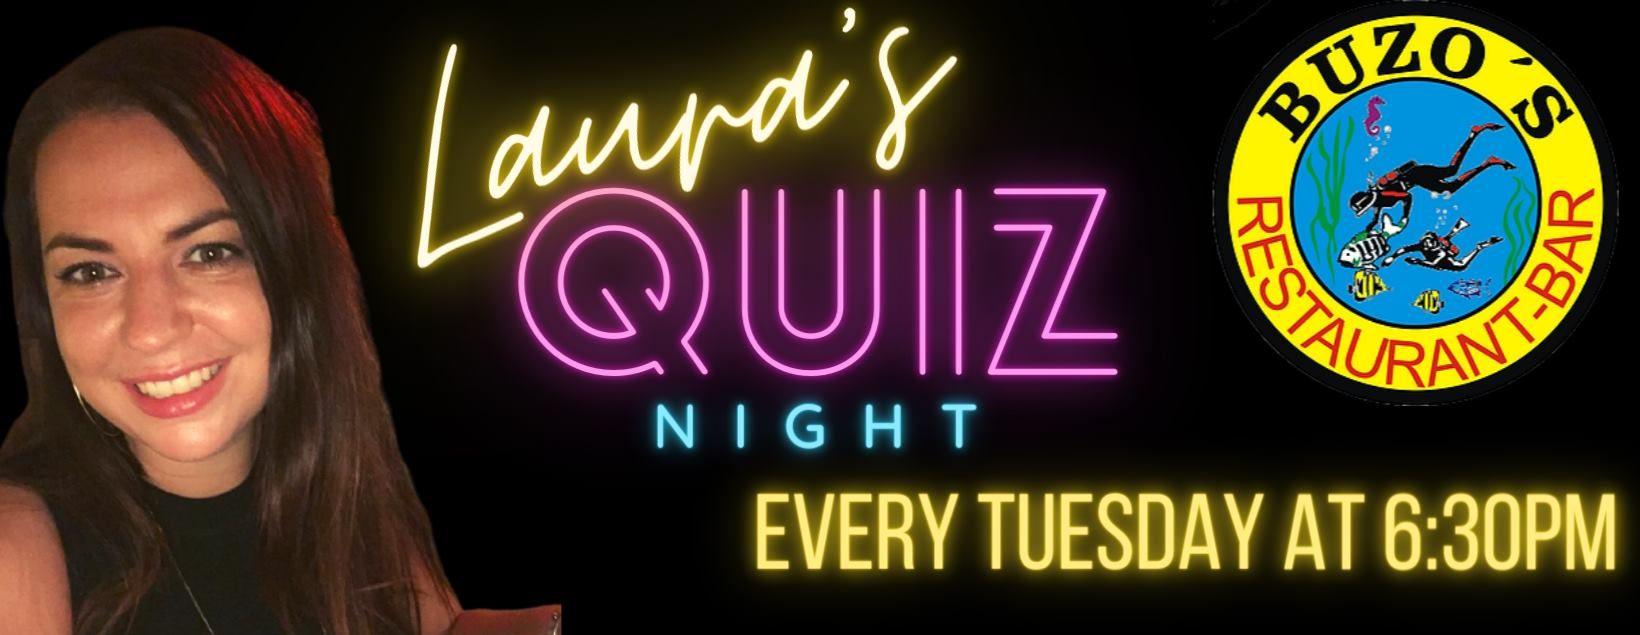 laura's quiz night tuesday trivia buzos